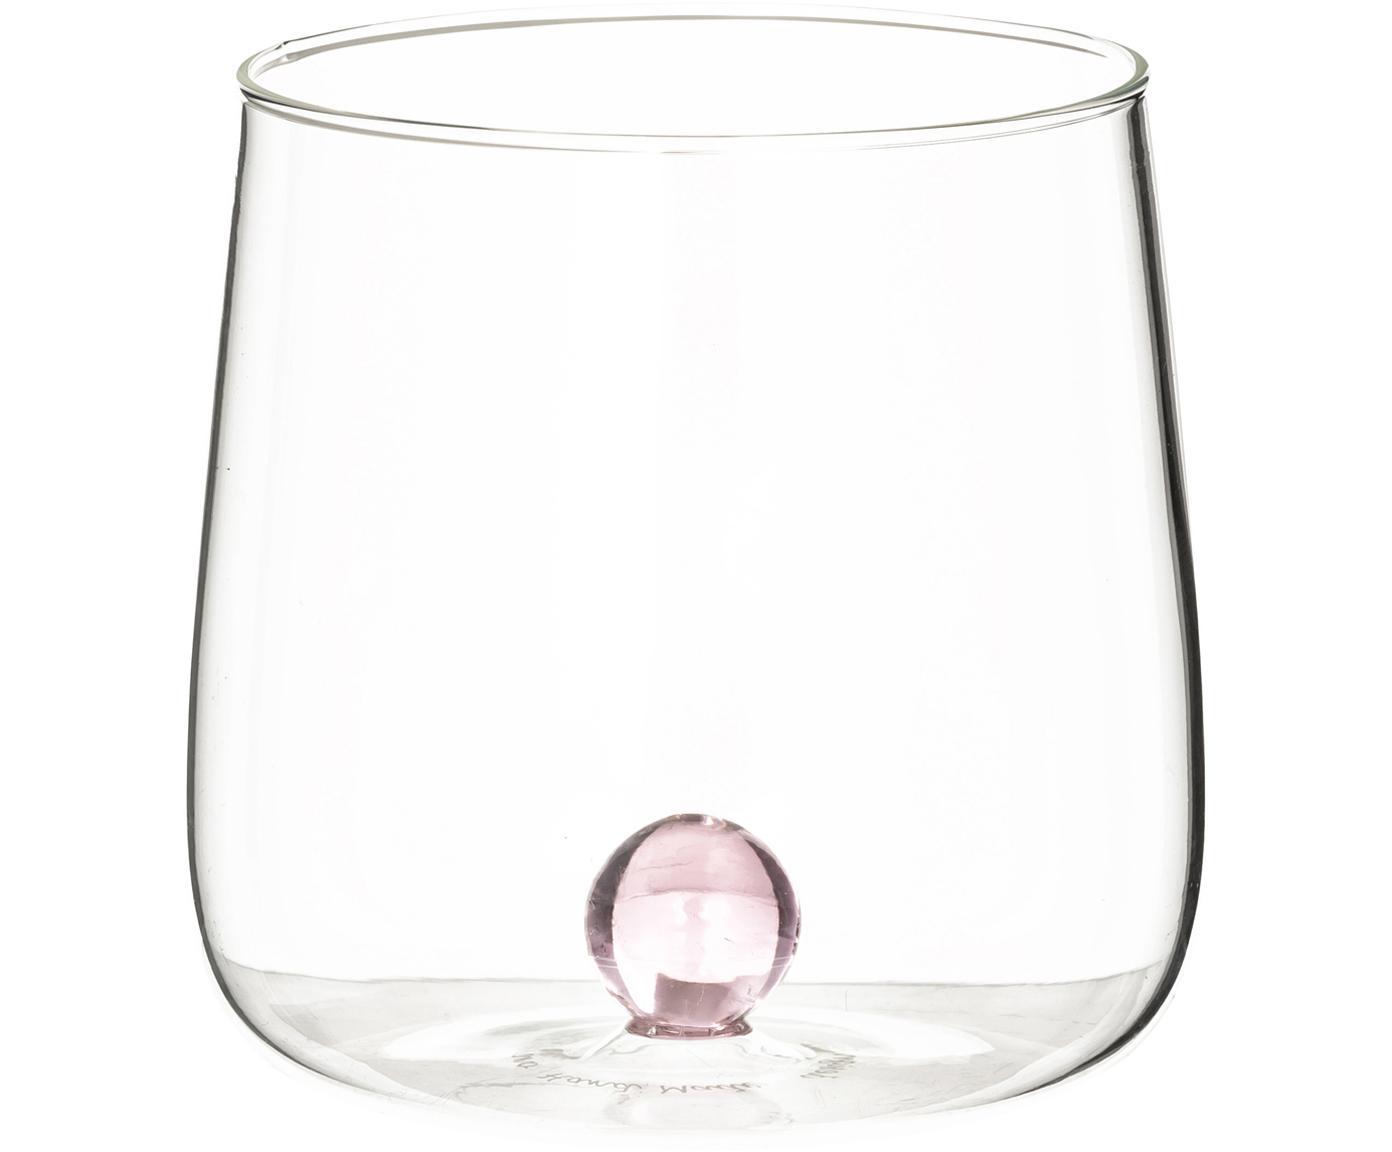 Vasos de vidrio soplado de diseño Bilia, 6uds., Vidrio de borosilicato, Transparente, rosa, Ø 9 x Al 9 cm